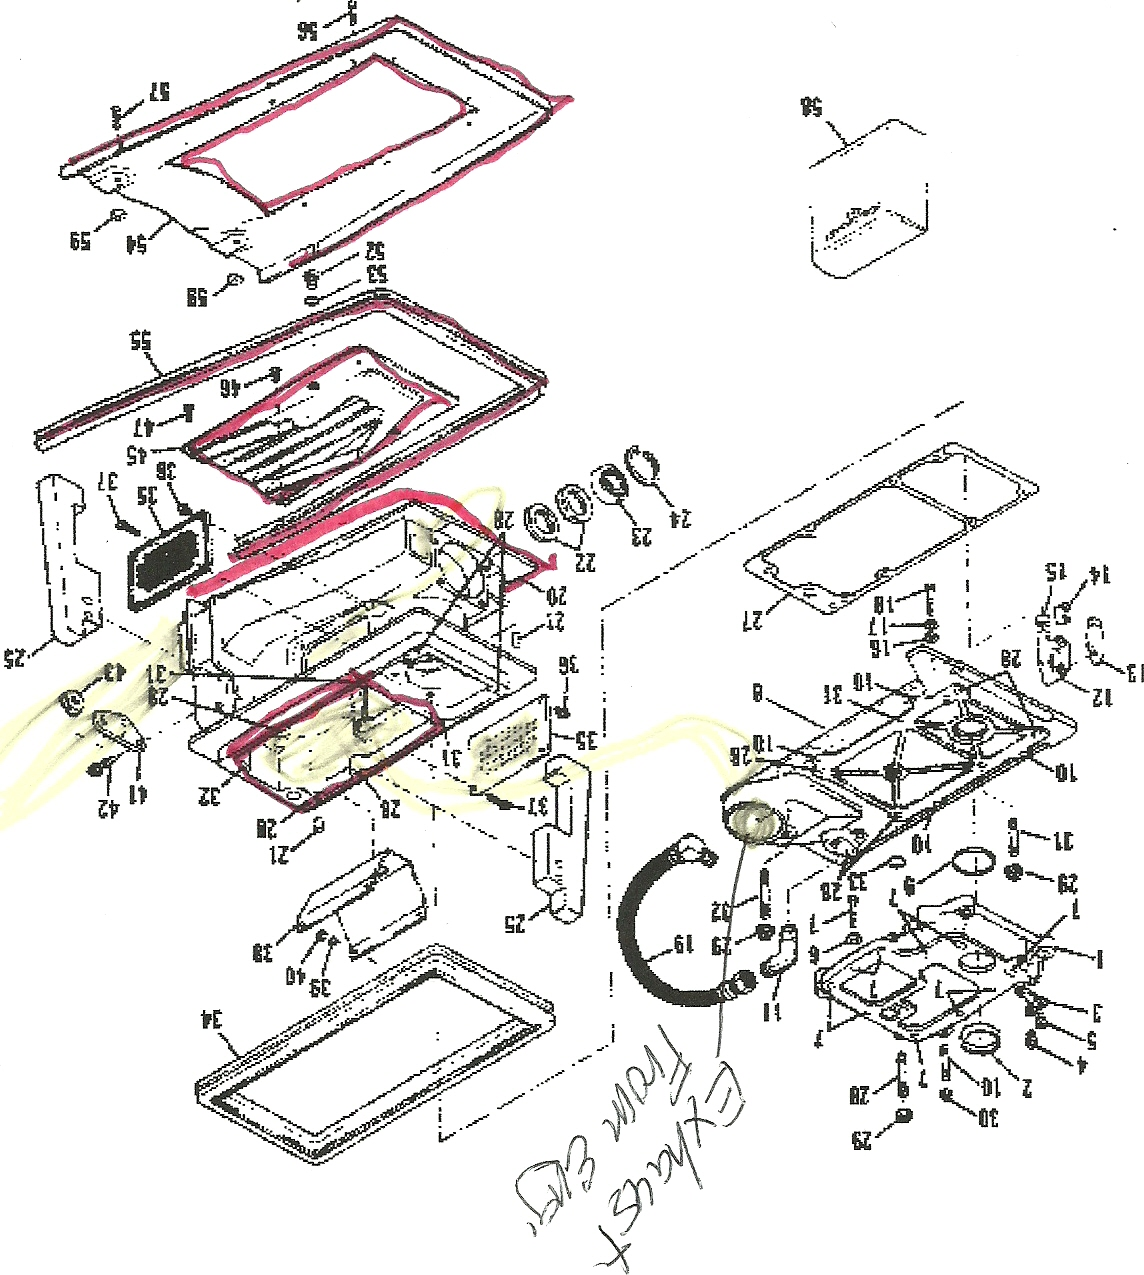 sugar sand jet boat wiring diagram wiring diagram and Mini Jet Boat Jet Boat Motors